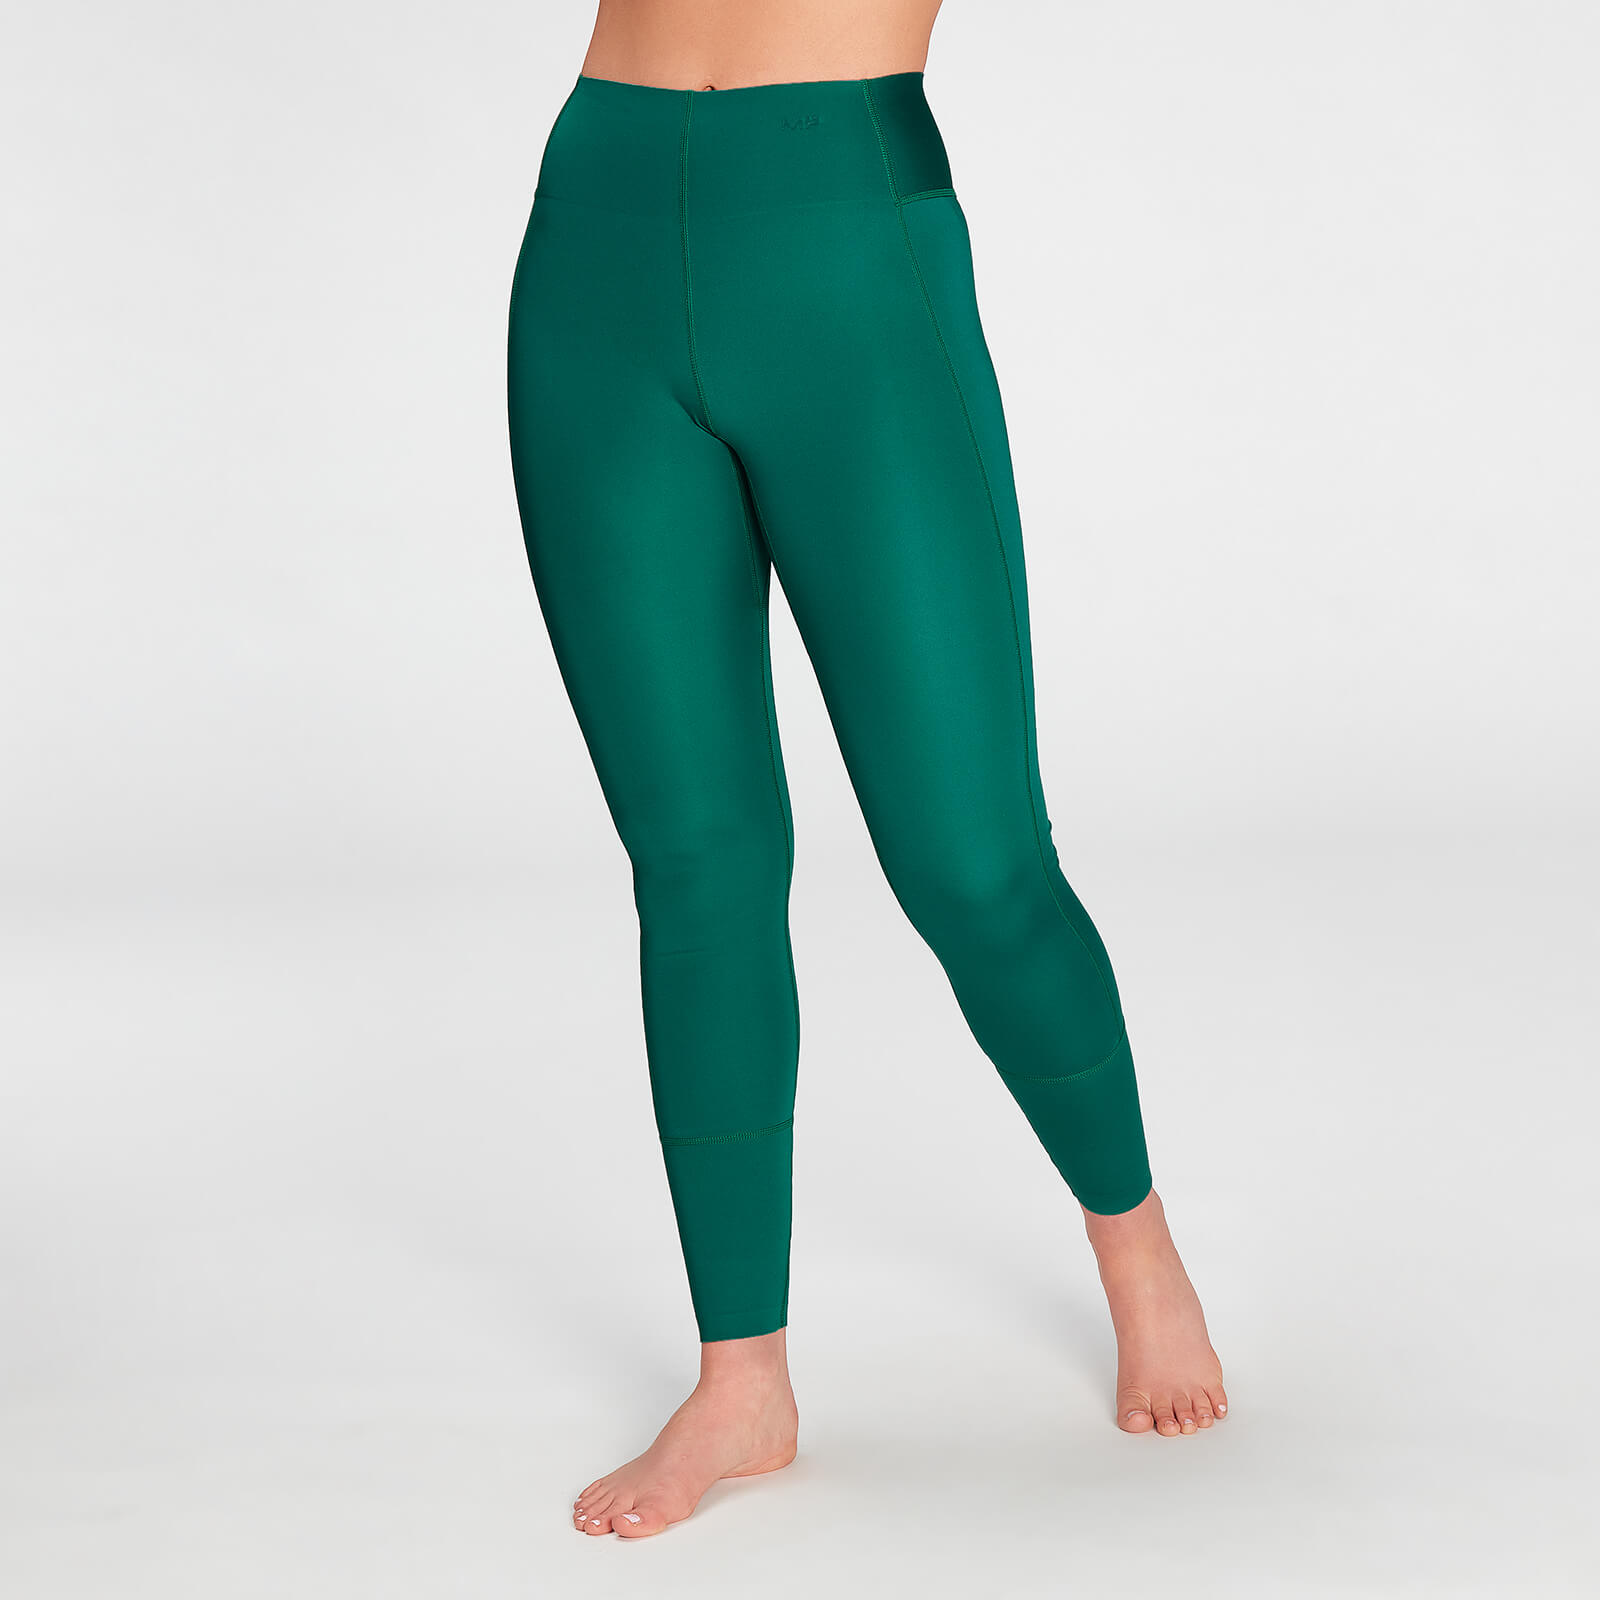 Купить MP Women's Composure Leggings- Energy Green - XXS, Myprotein International